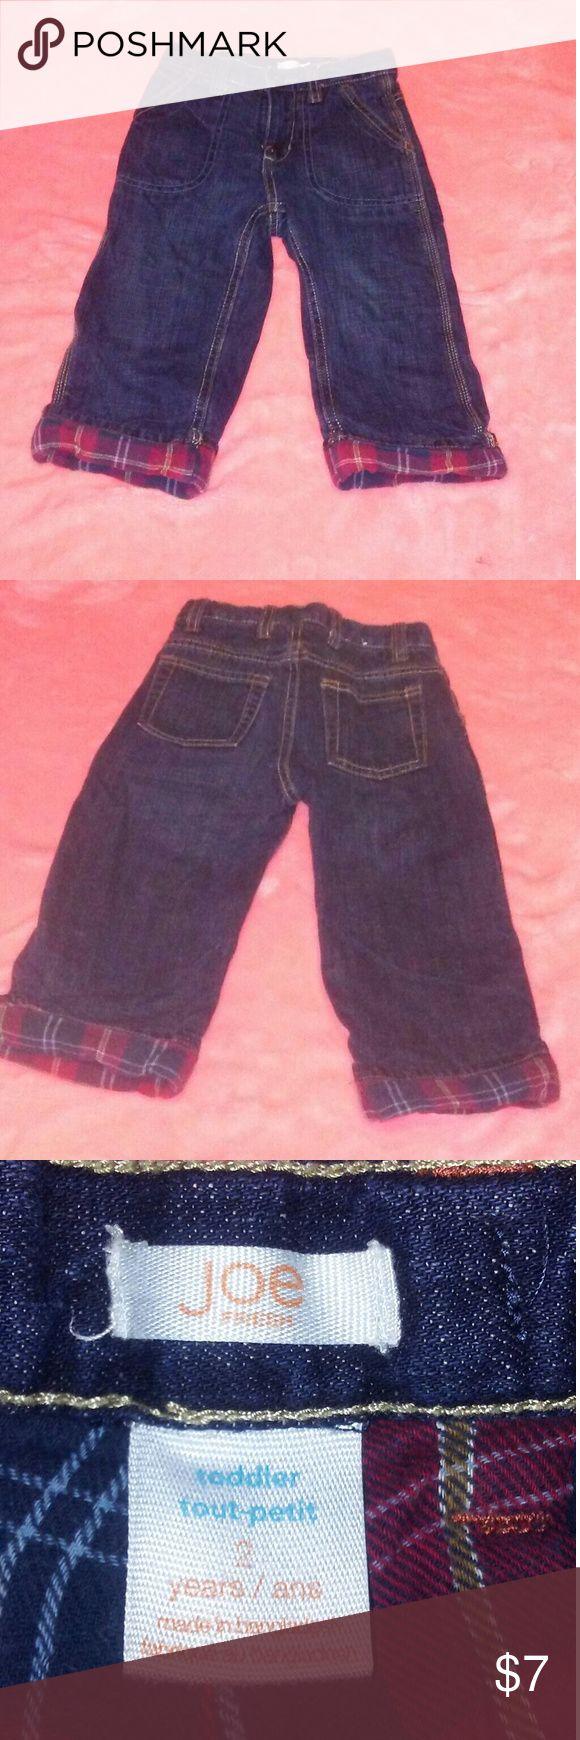 Joe Fresh Blue Jeans Size 2t Joe Fresh Dark Wash Blue Jeans with Red Plaid fabric pn the bottoms of the pant legs Joe Fresh Bottoms Jeans